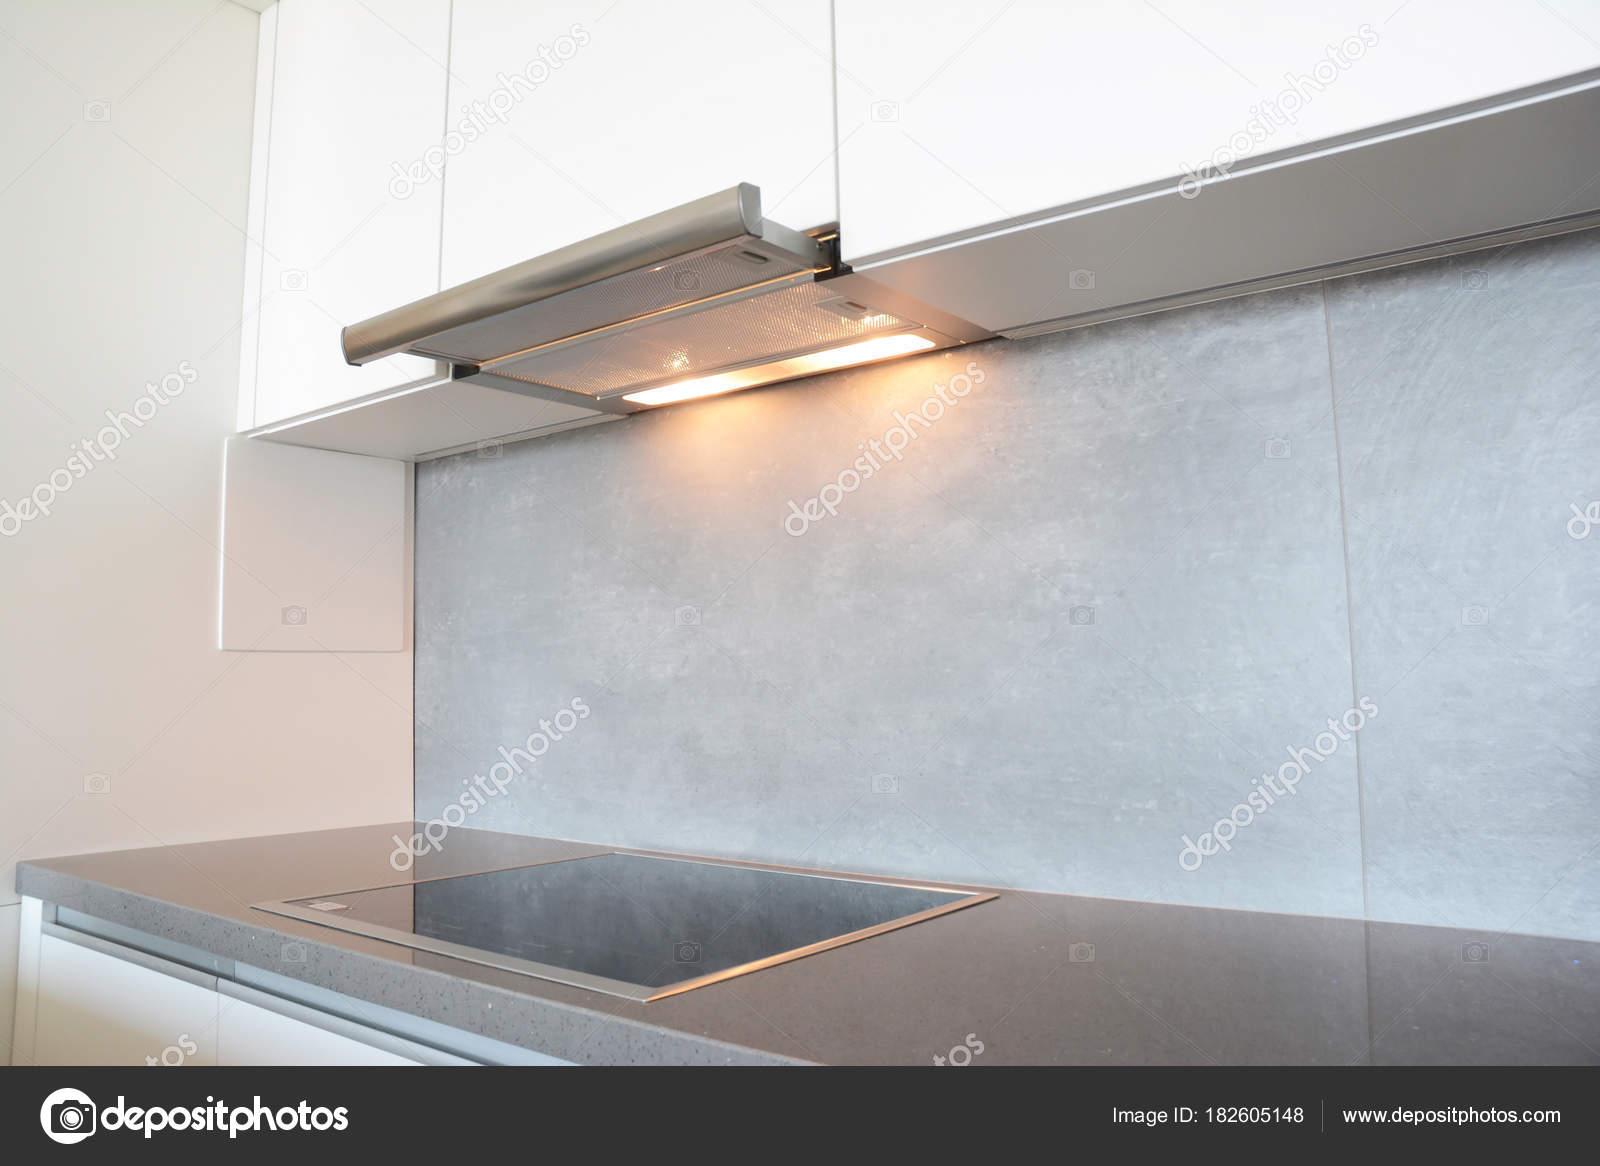 Chiuda in su moderno aria aspiratore cucina ventilatore o cappa ...